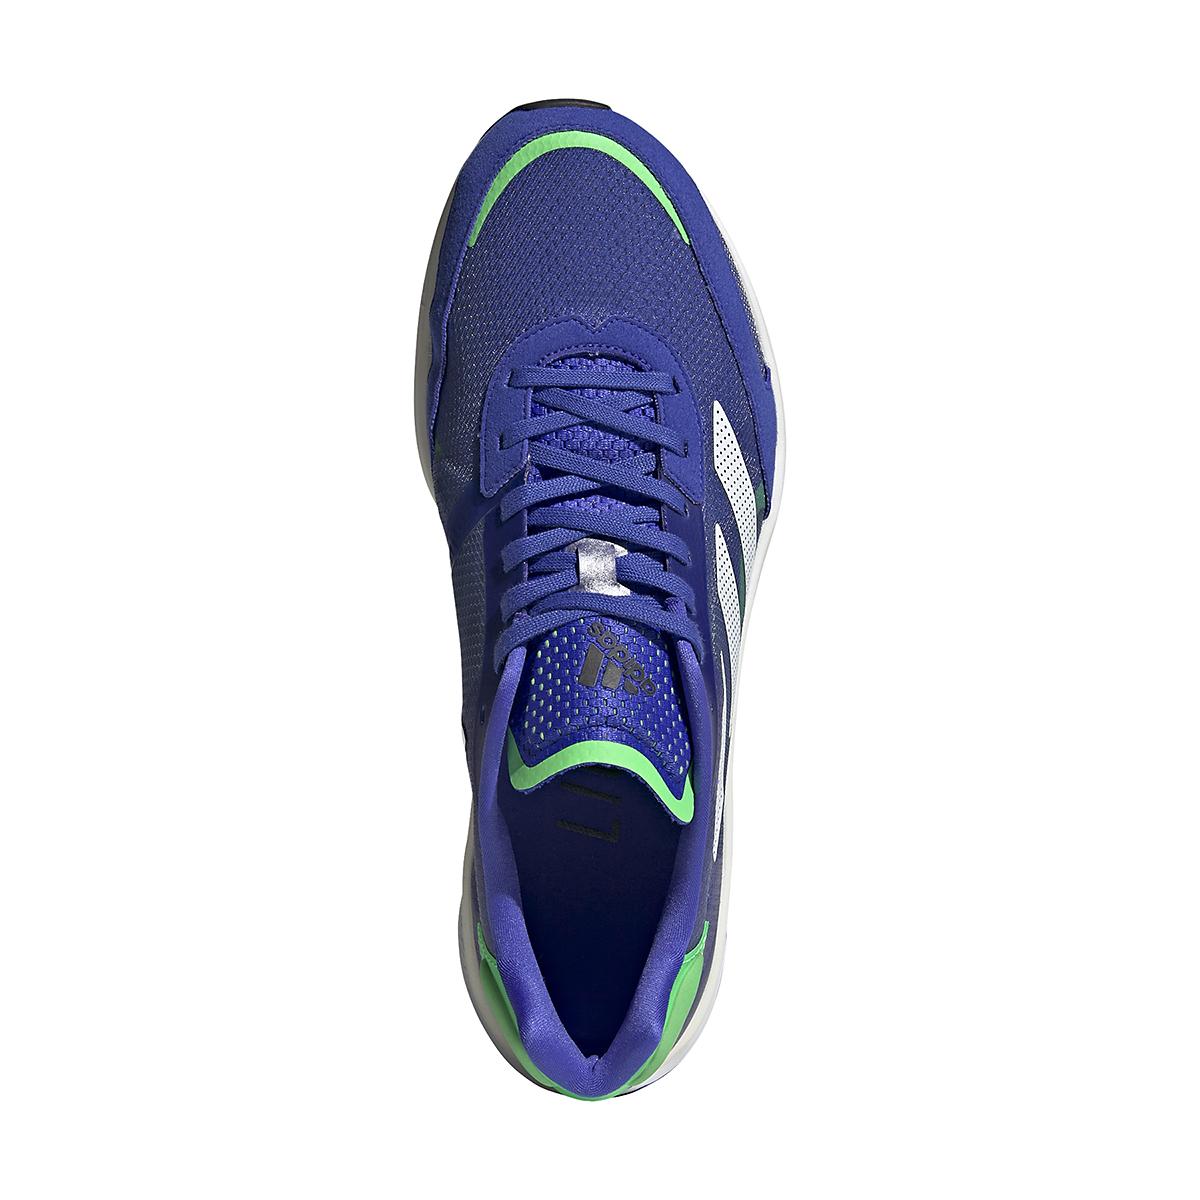 Men's Adidas Adizero Boston 10 Running Shoe - Color: Sonic Ink/White/Screaming Green - Size: 6.5 - Width: Regular, Sonic Ink/White/Screaming Green, large, image 7